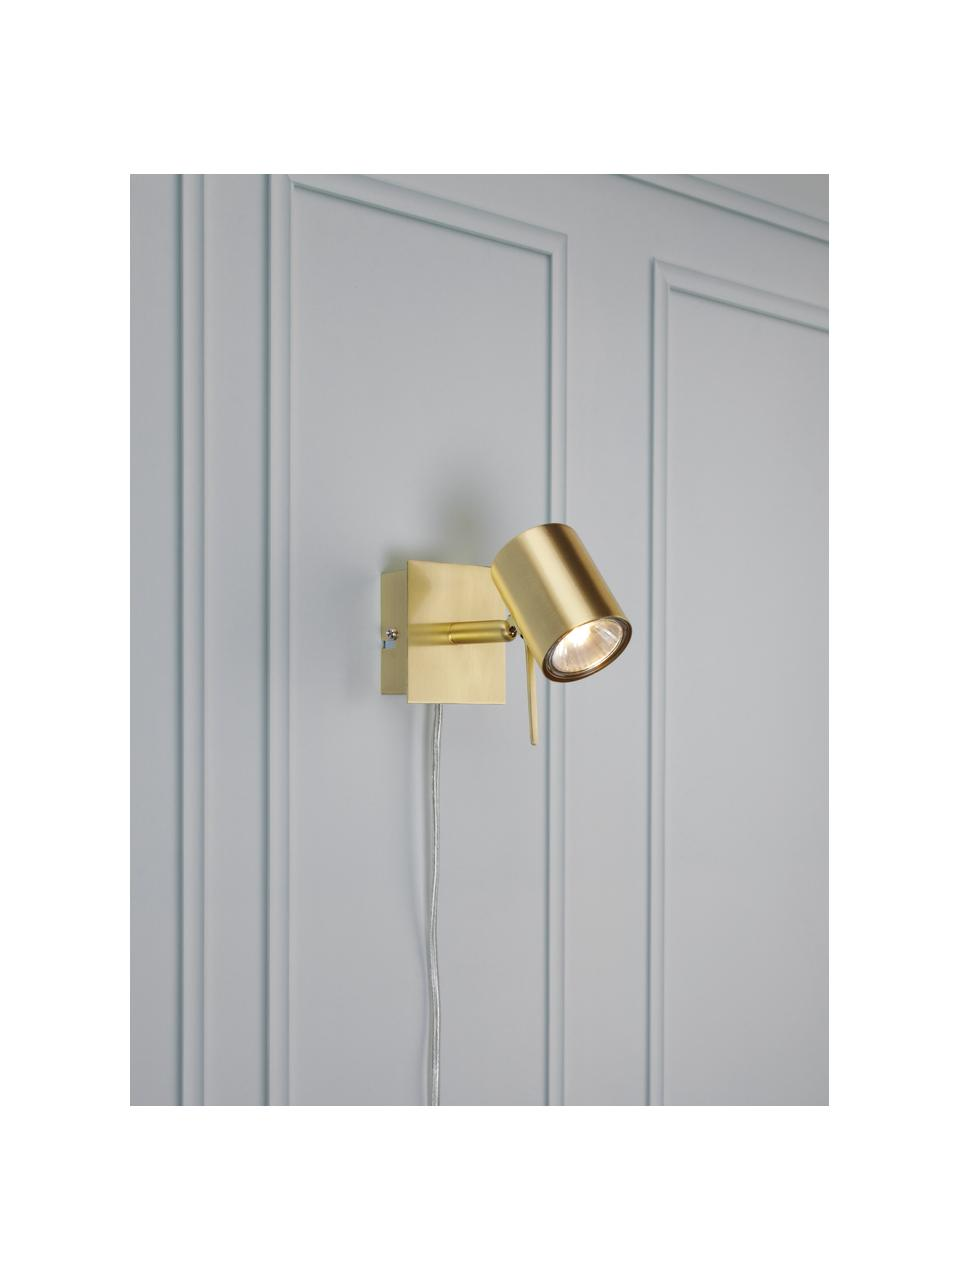 Wandstrahler Hyssna mit Stecker, Lampenschirm: Metall, vermessingt, Messing, 8 x 9 cm